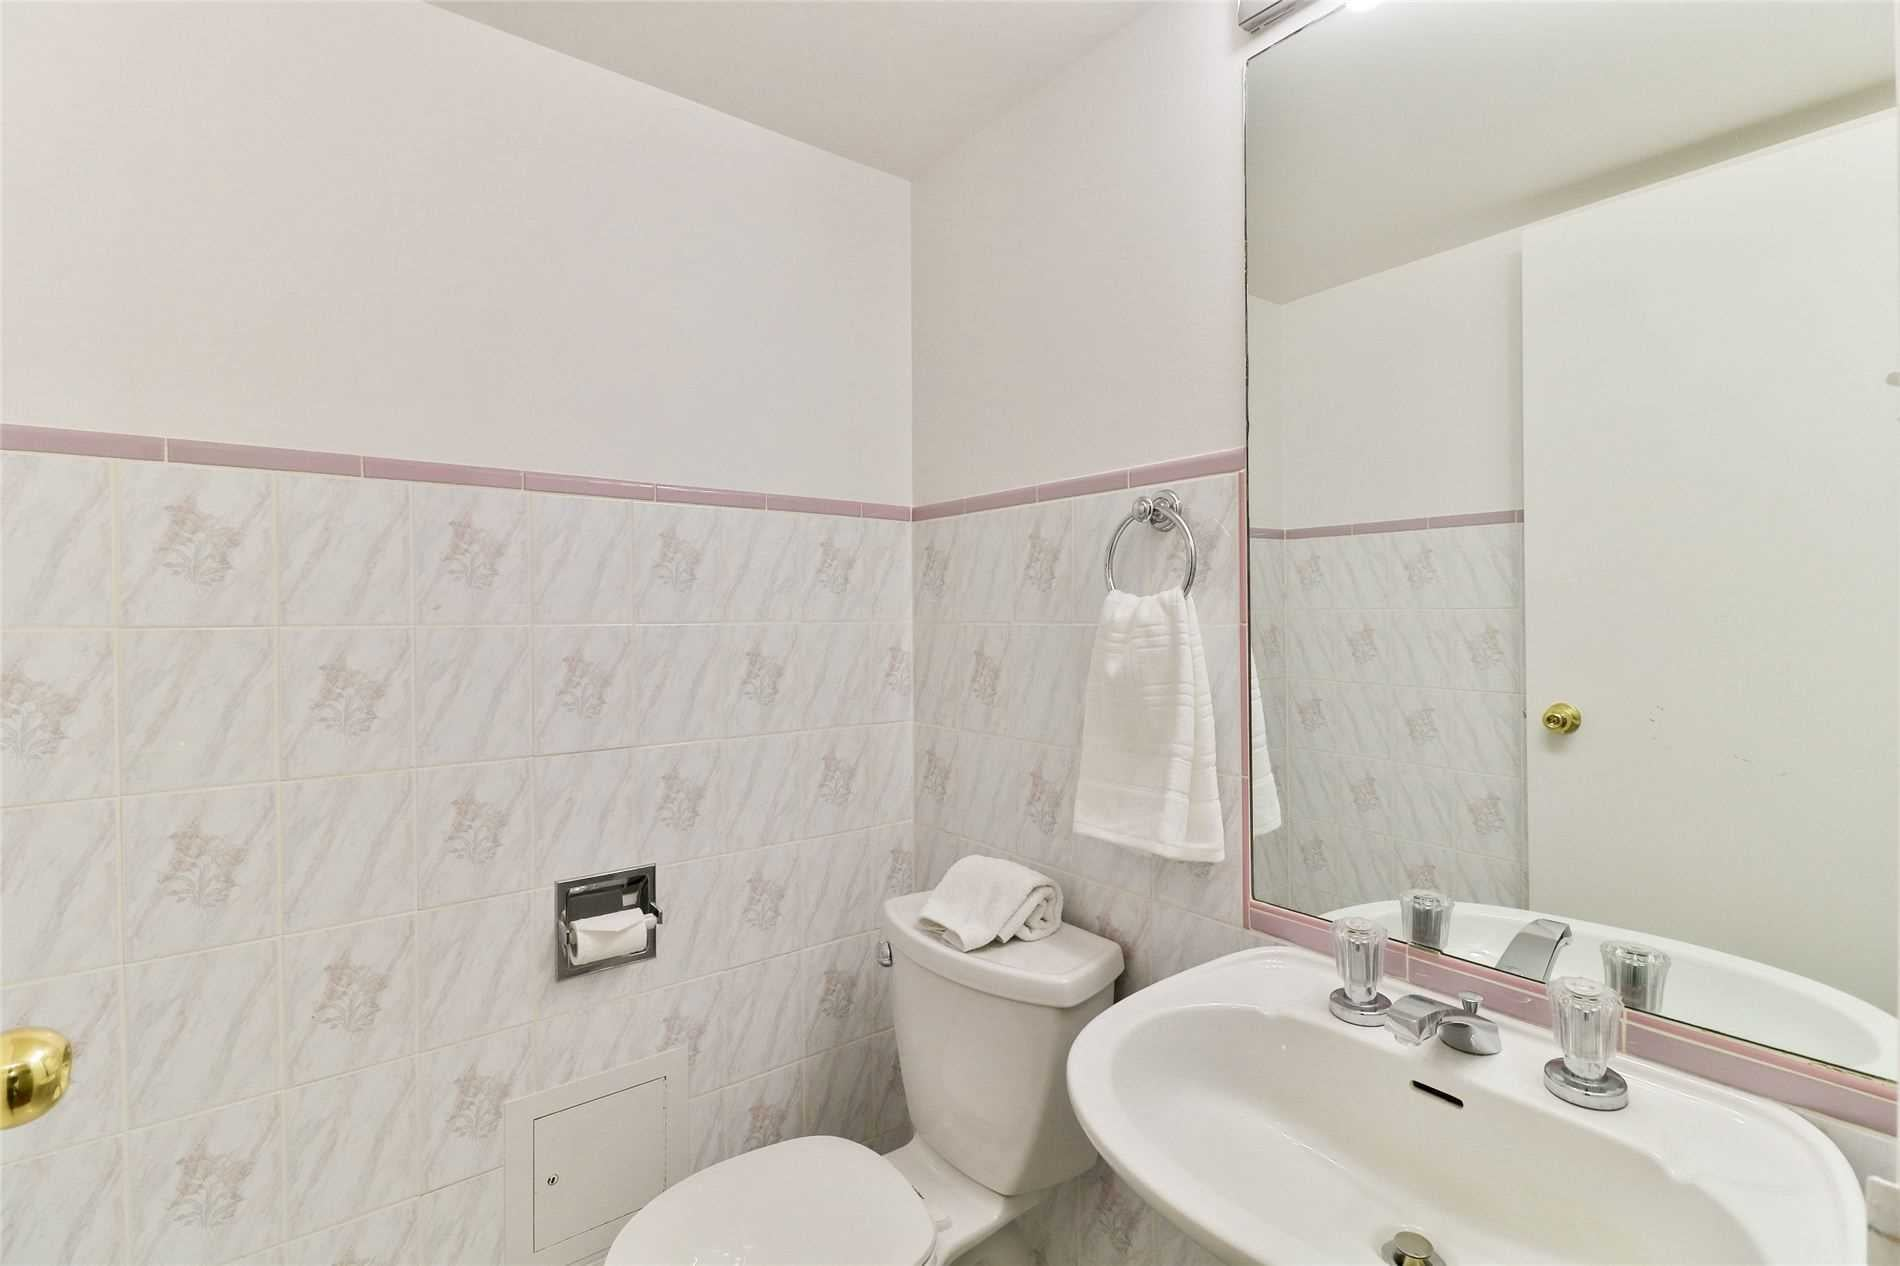 304 - 35 Church St - Church-Yonge Corridor Condo Apt for sale, 1 Bedroom (C5399330) - #19